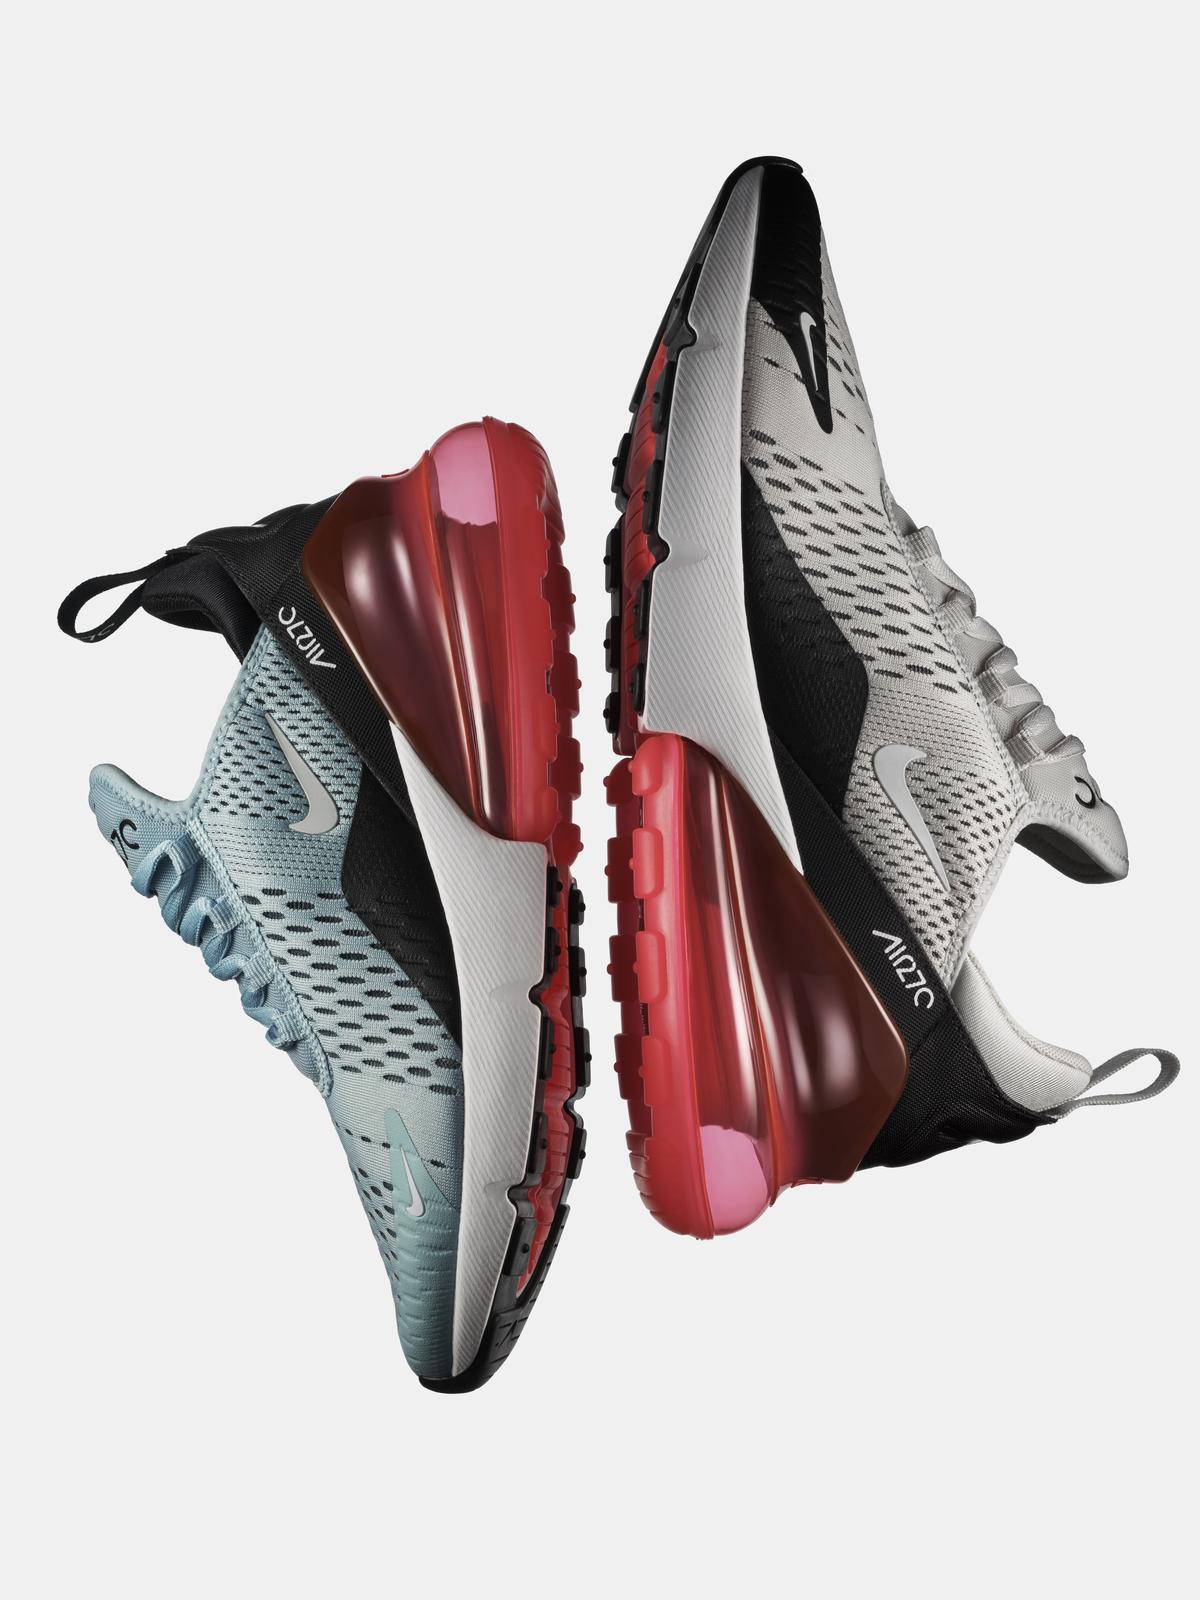 Nike_AM270_duo2_jpeg_native_1600.jpg